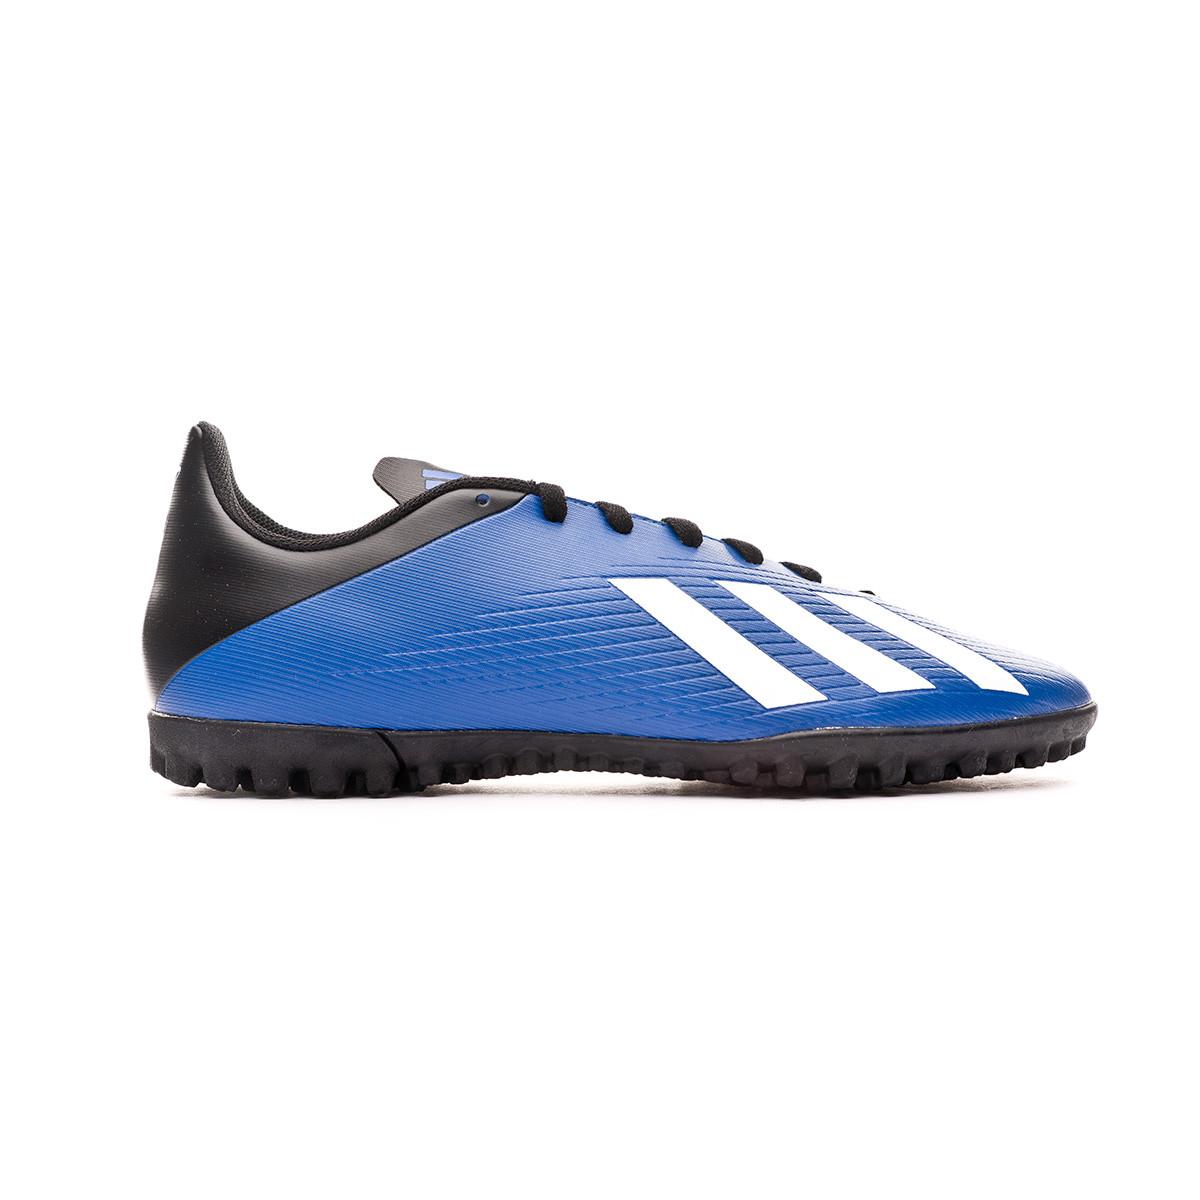 No hagas blusa Intacto  Football Boot adidas X 19.4 Turf Team royal blue-White-Black - Football  store Fútbol Emotion